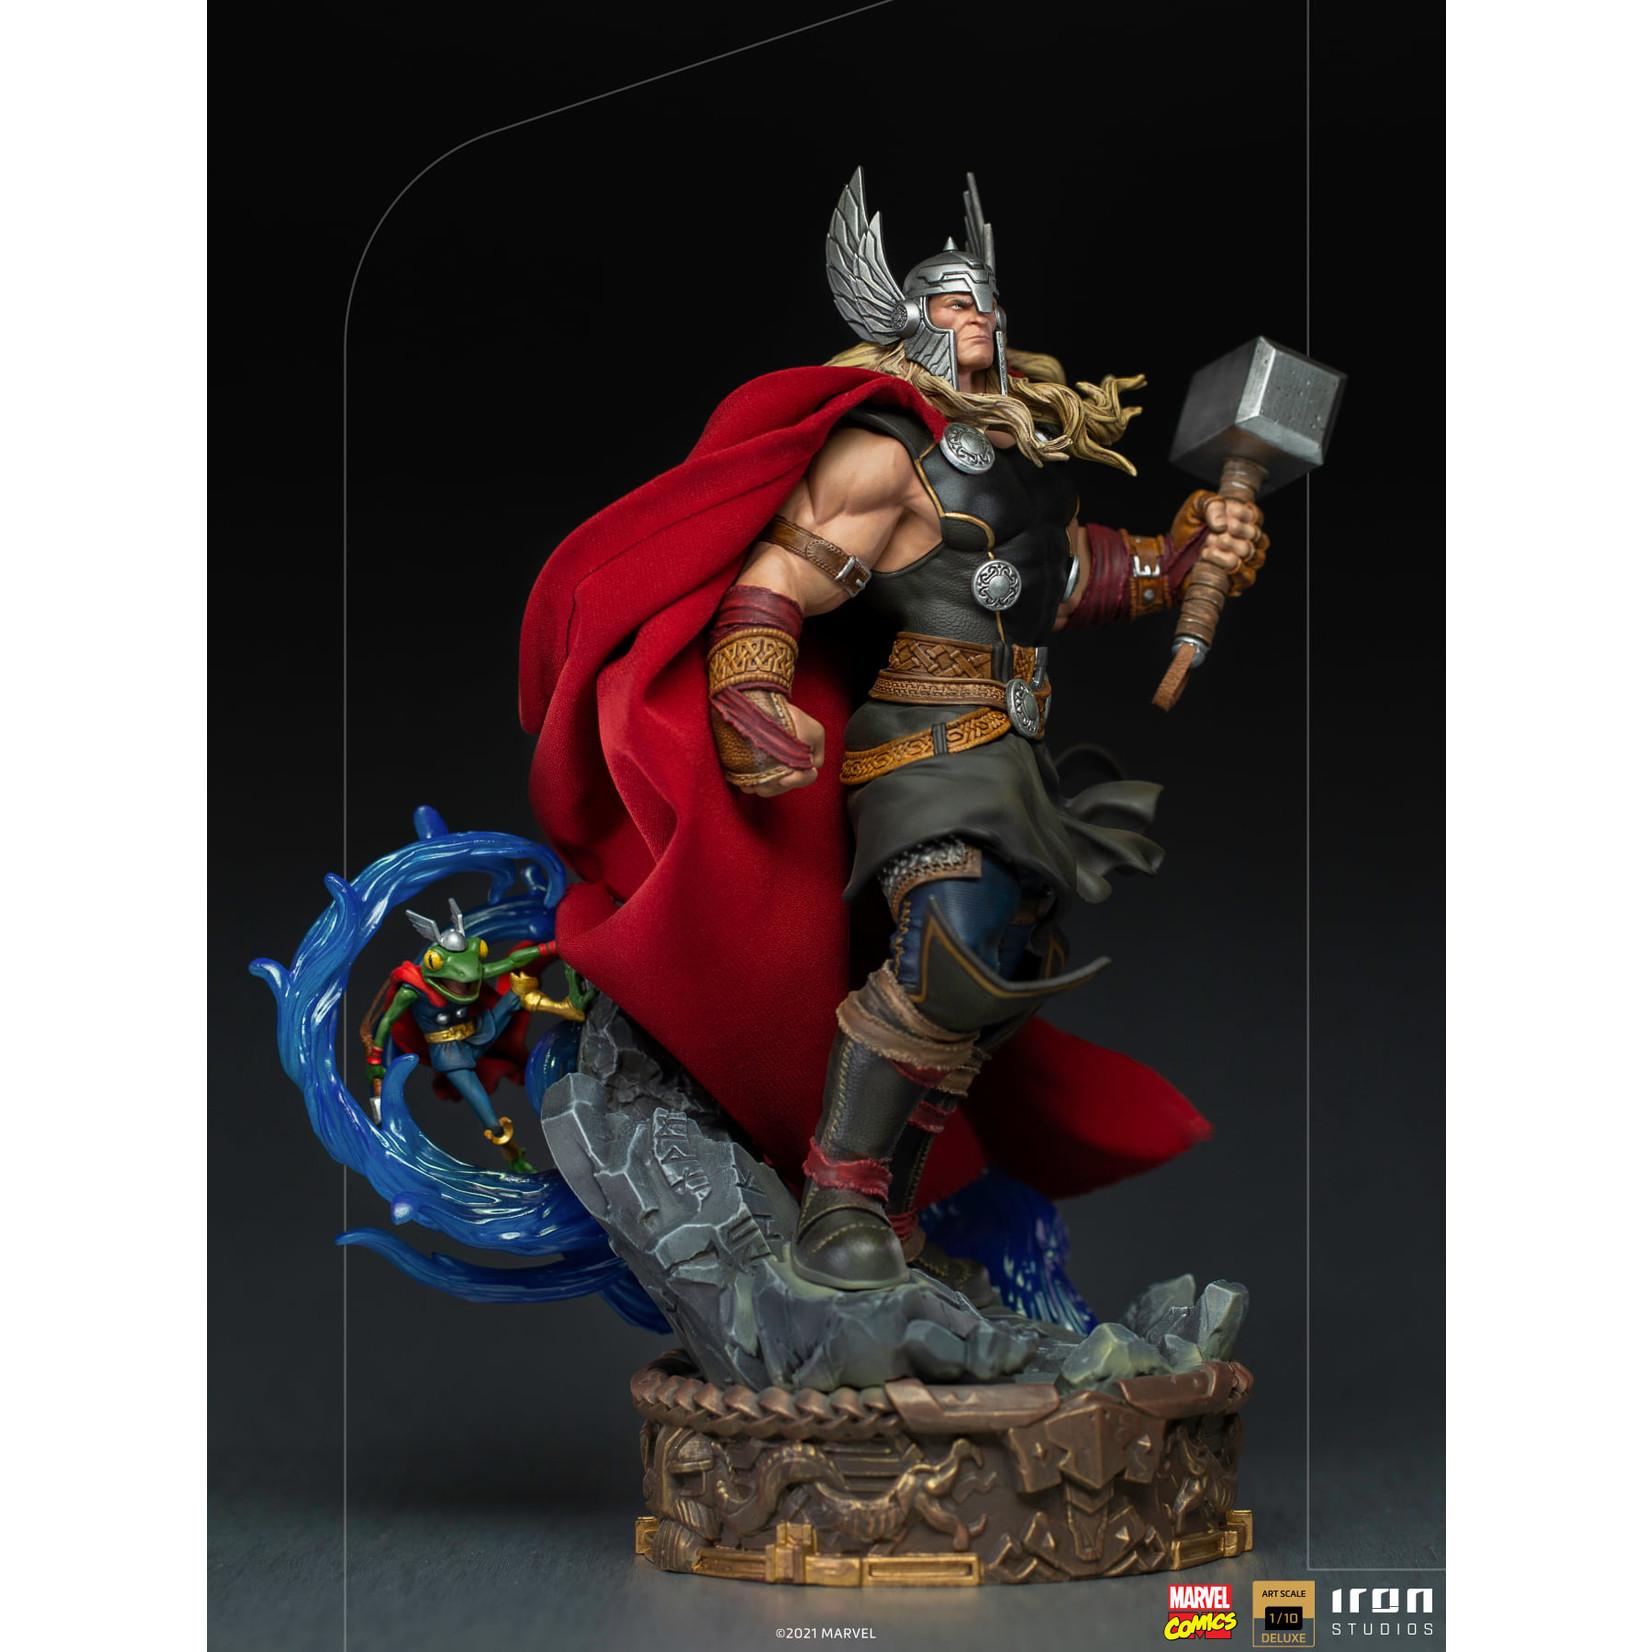 Iron Studios [Preorder] Iron Studios Thor Unleashed Deluxe - Art Scale 1/10 - Marvel Comics